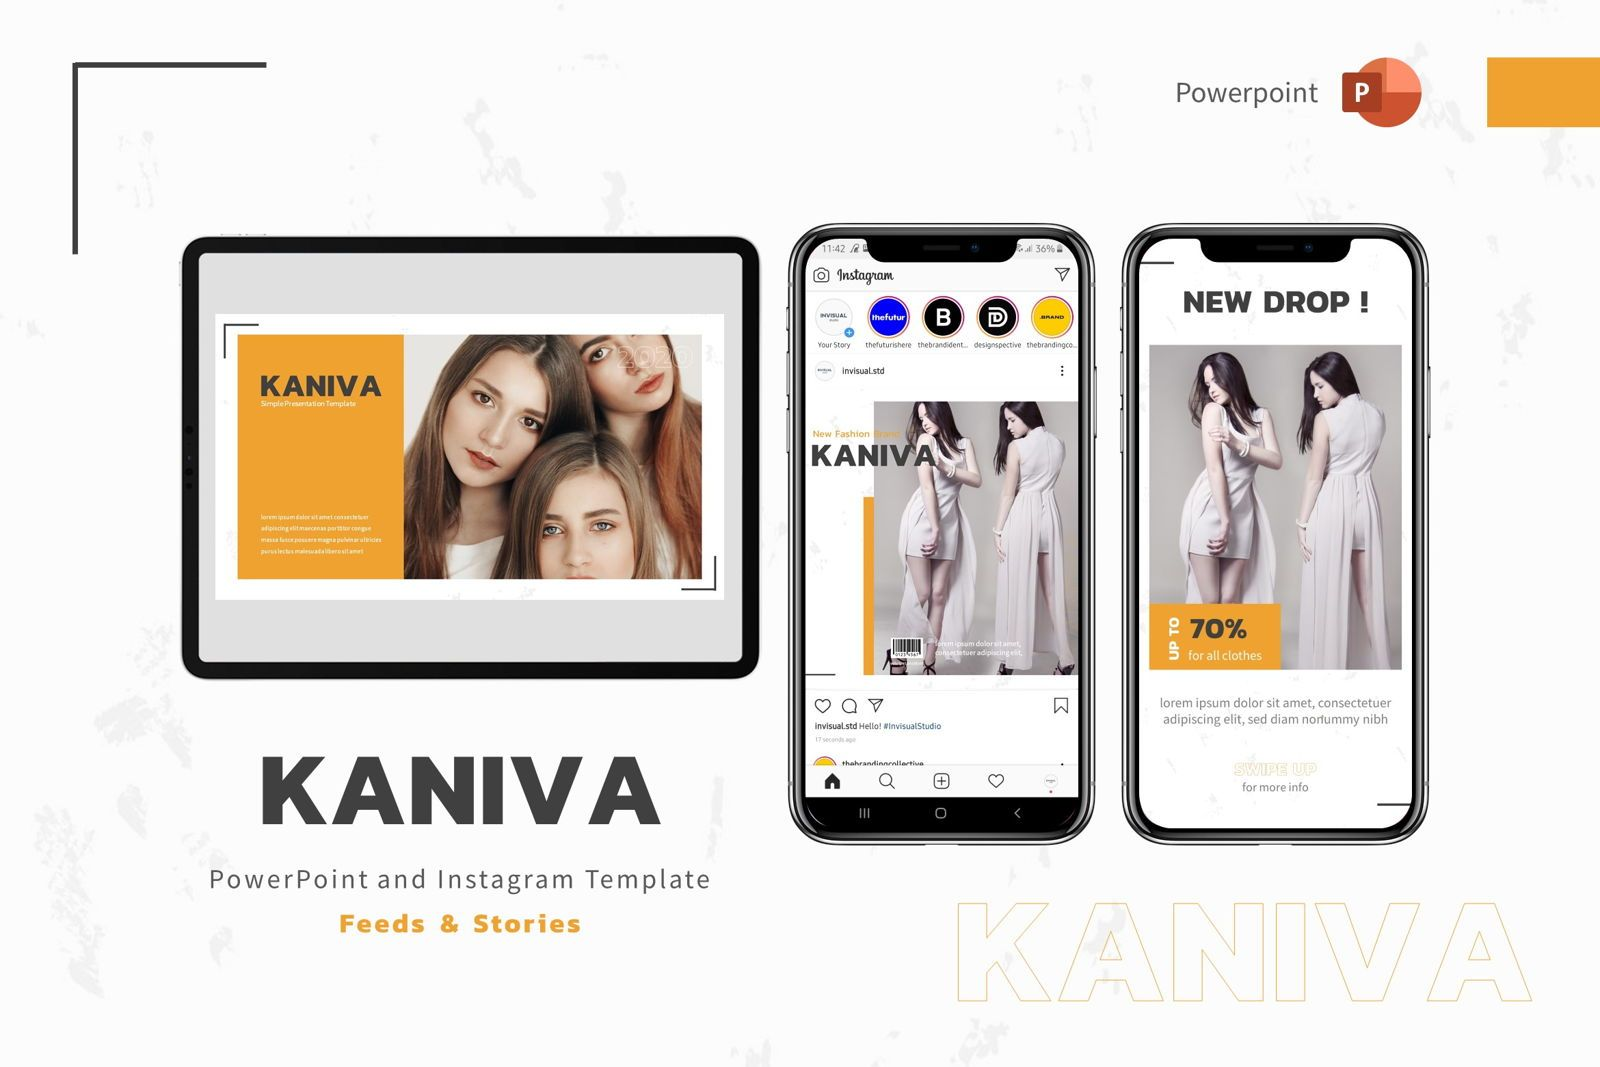 Kaniva - Powerpoint Template, 08001, Presentation Templates — PoweredTemplate.com